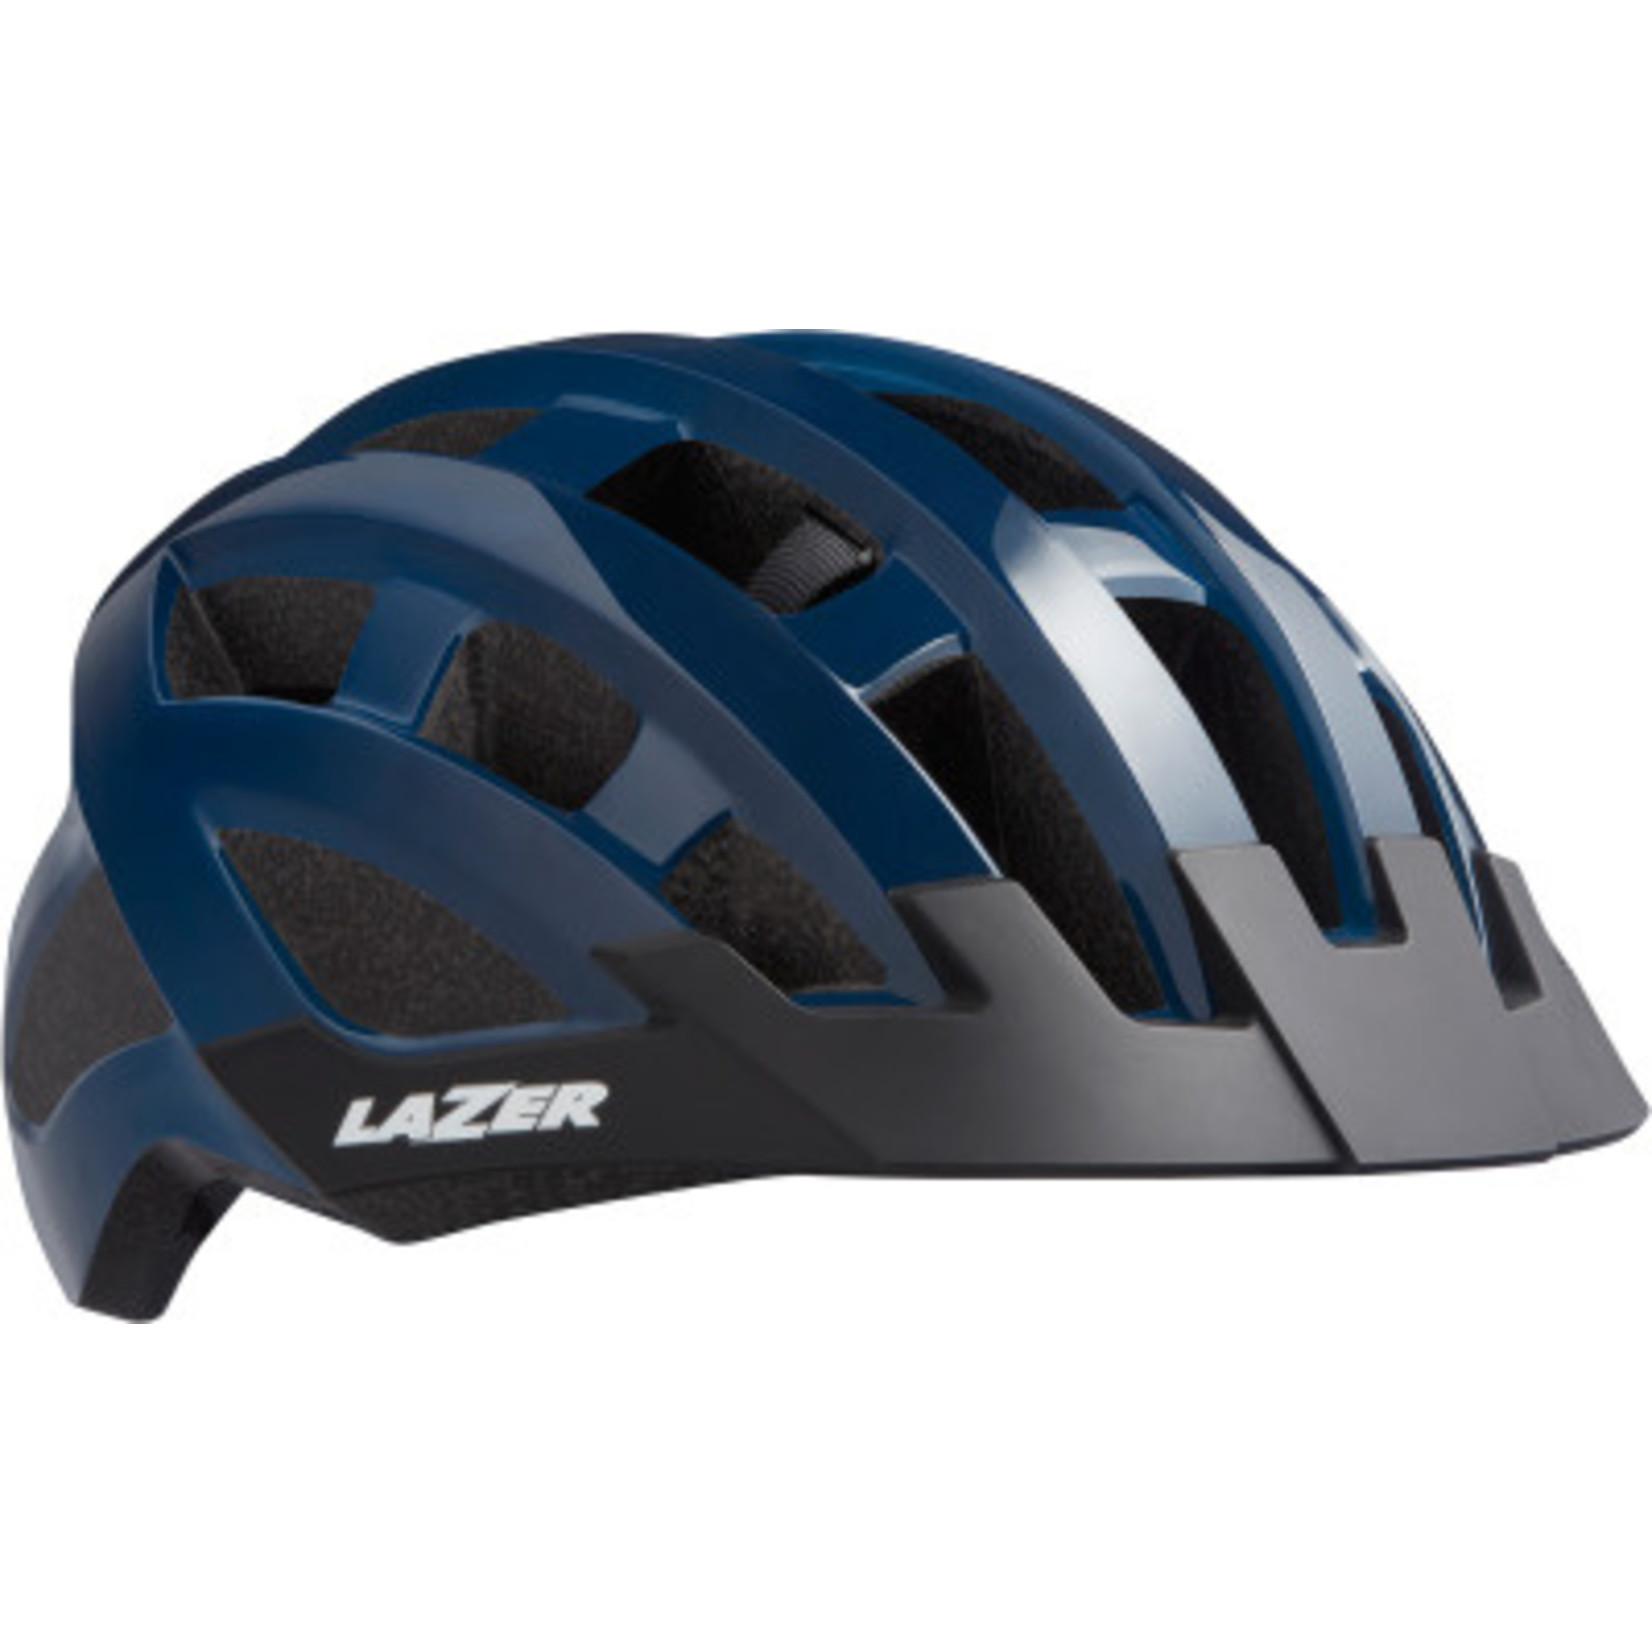 Lazer LAZER COMPACT  HELMET 51-61 CM UNISEX